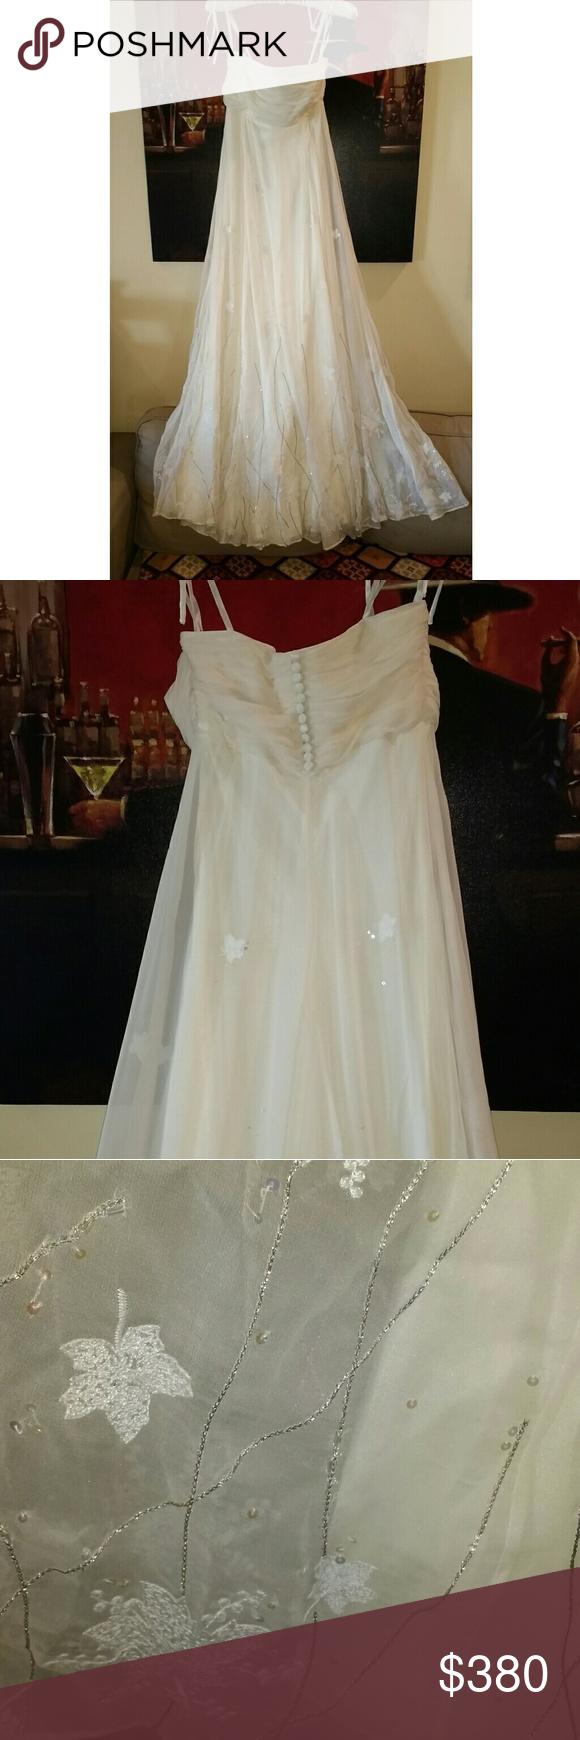 Famous Jasper Conran Wedding Dresses Collection - Colorful Wedding ...